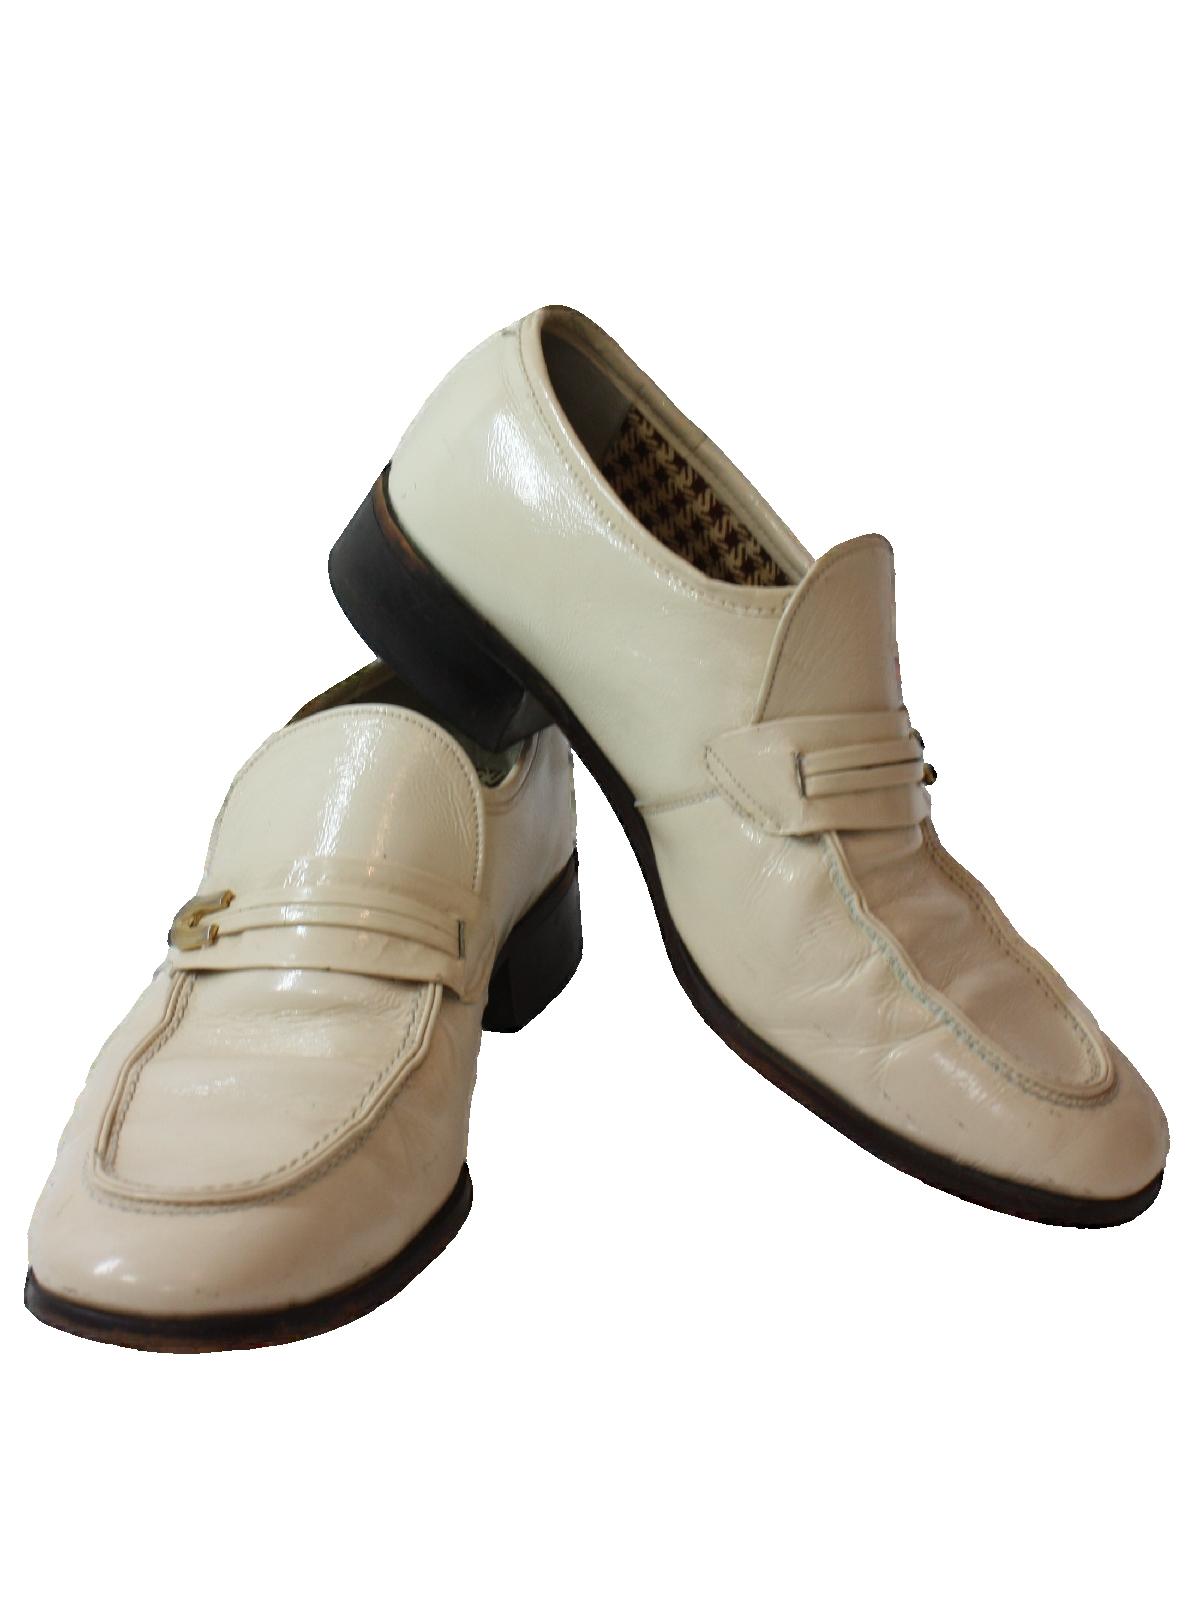 ddf9c1f18cfa1 1970's Mens Loafer Pimp Shoes